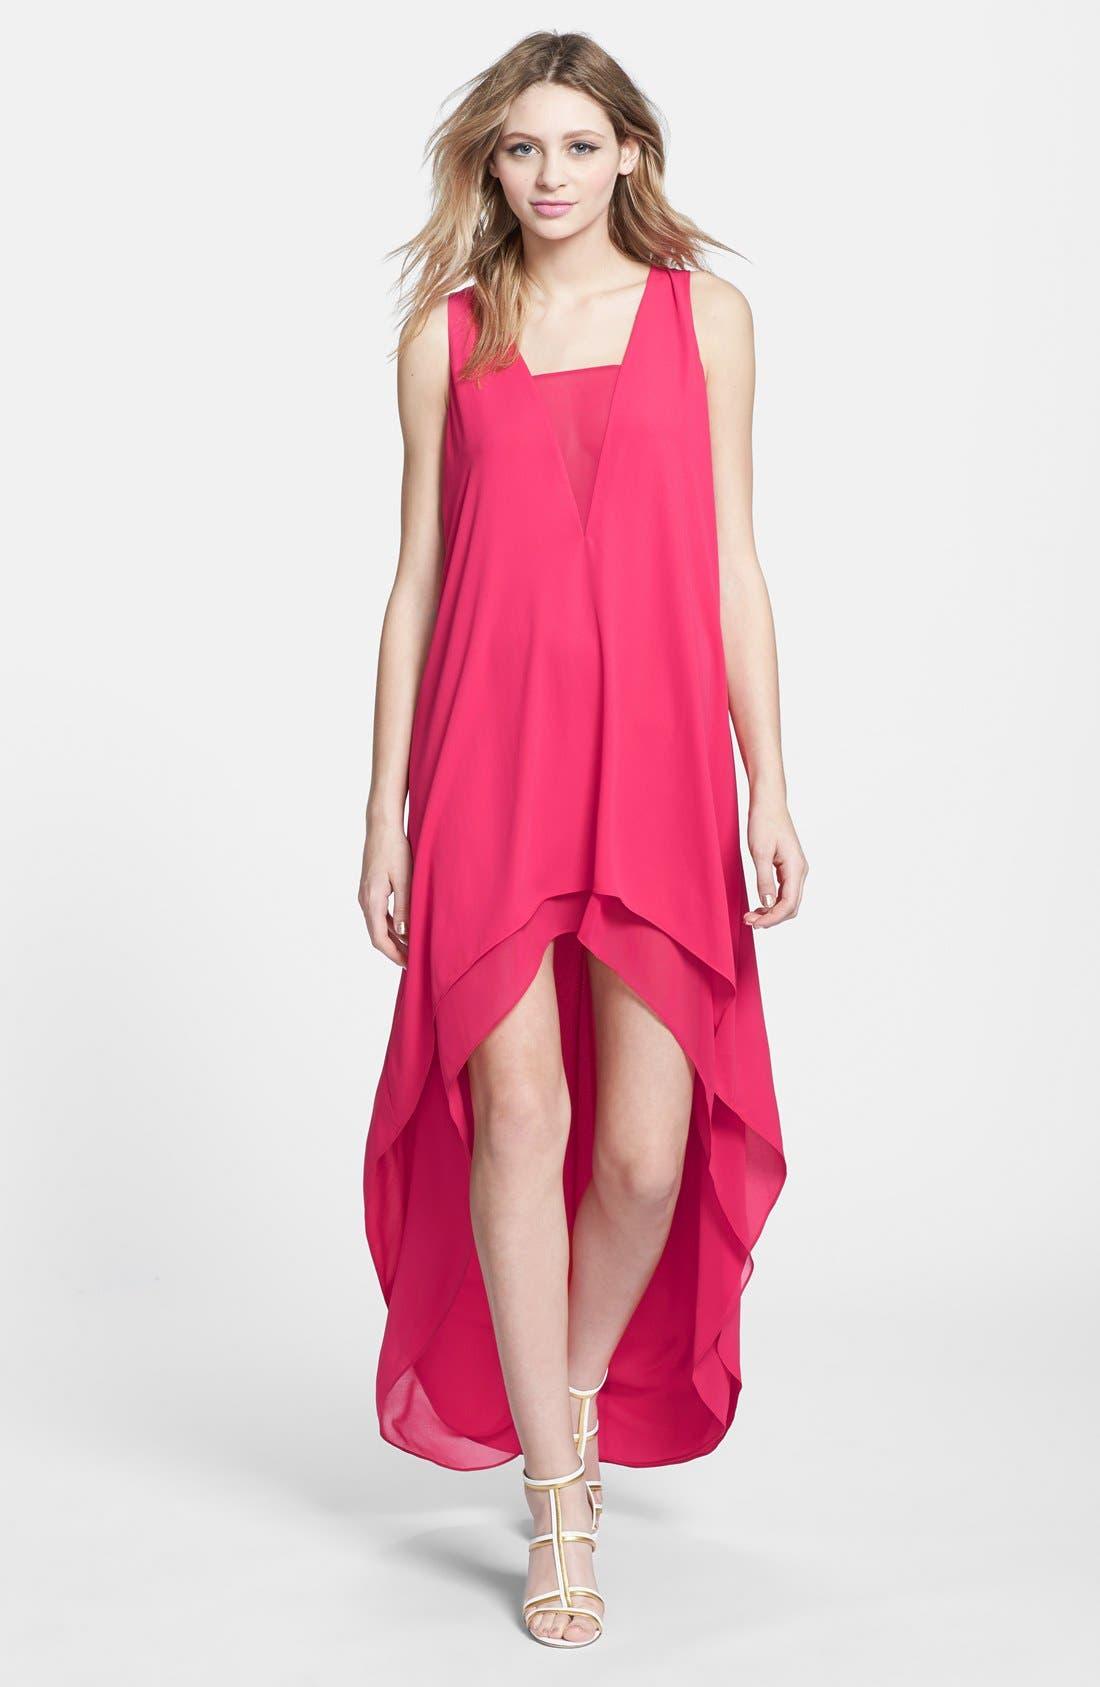 Alternate Image 1 Selected - BCBGMAXAZRIA 'Ivana' High/Low Georgette Dress